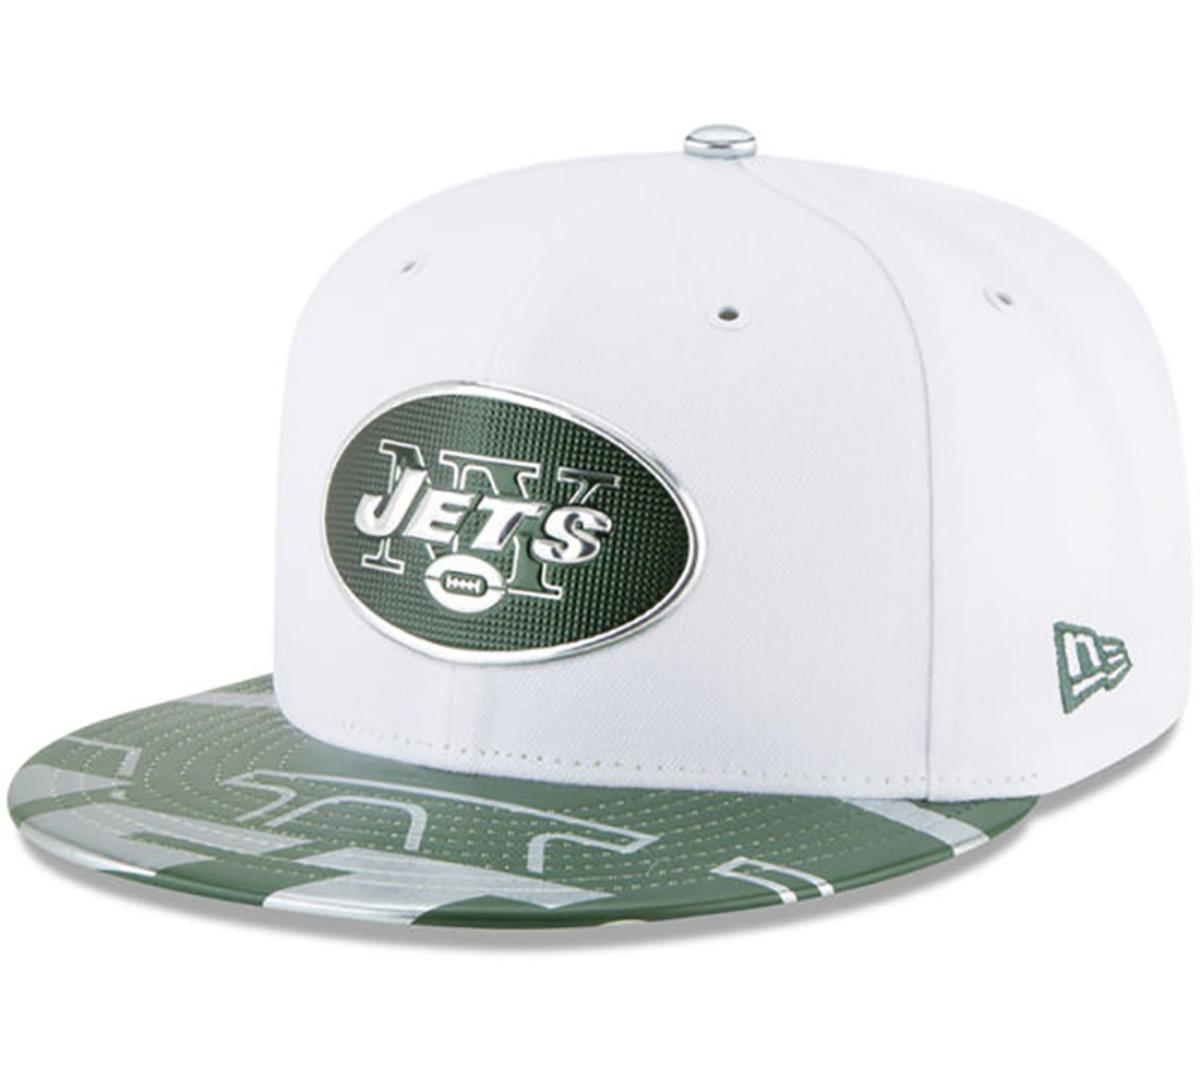 jets-draft-hat-ranking.jpg